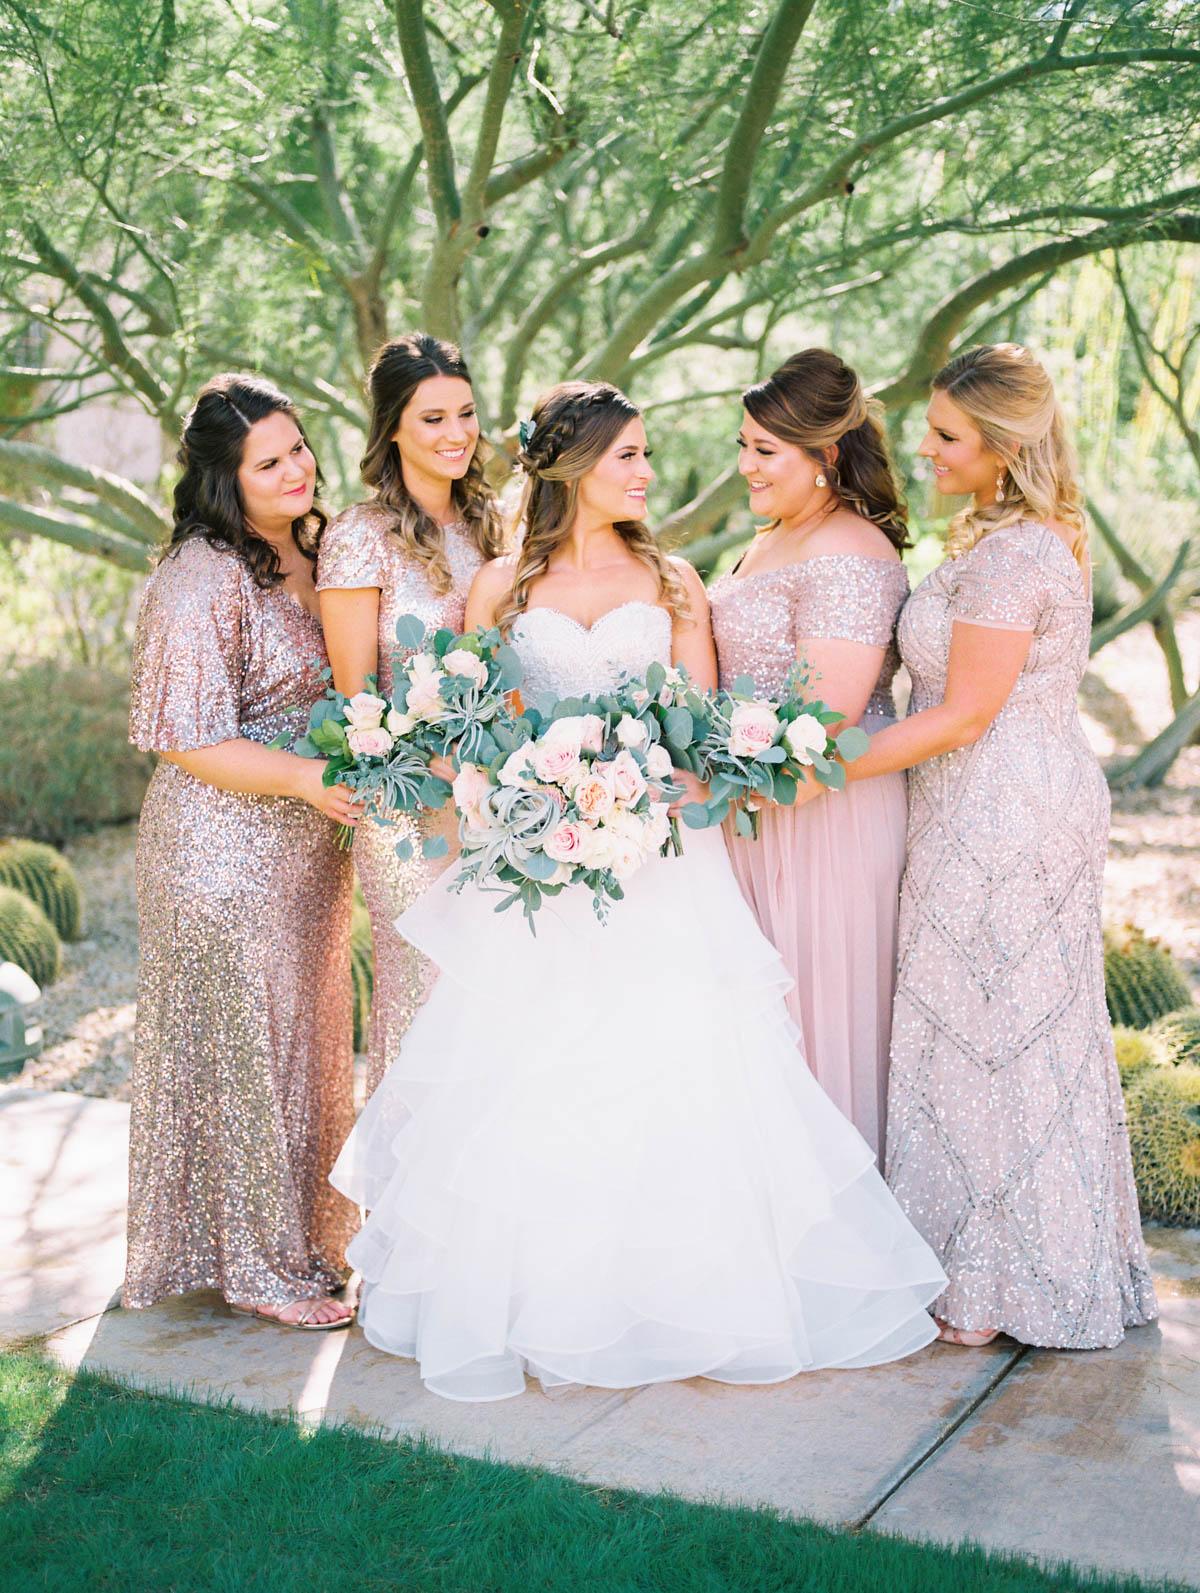 Sparkling blush bridesmaids captured by Tucson Wedding Photographers Betsy & John